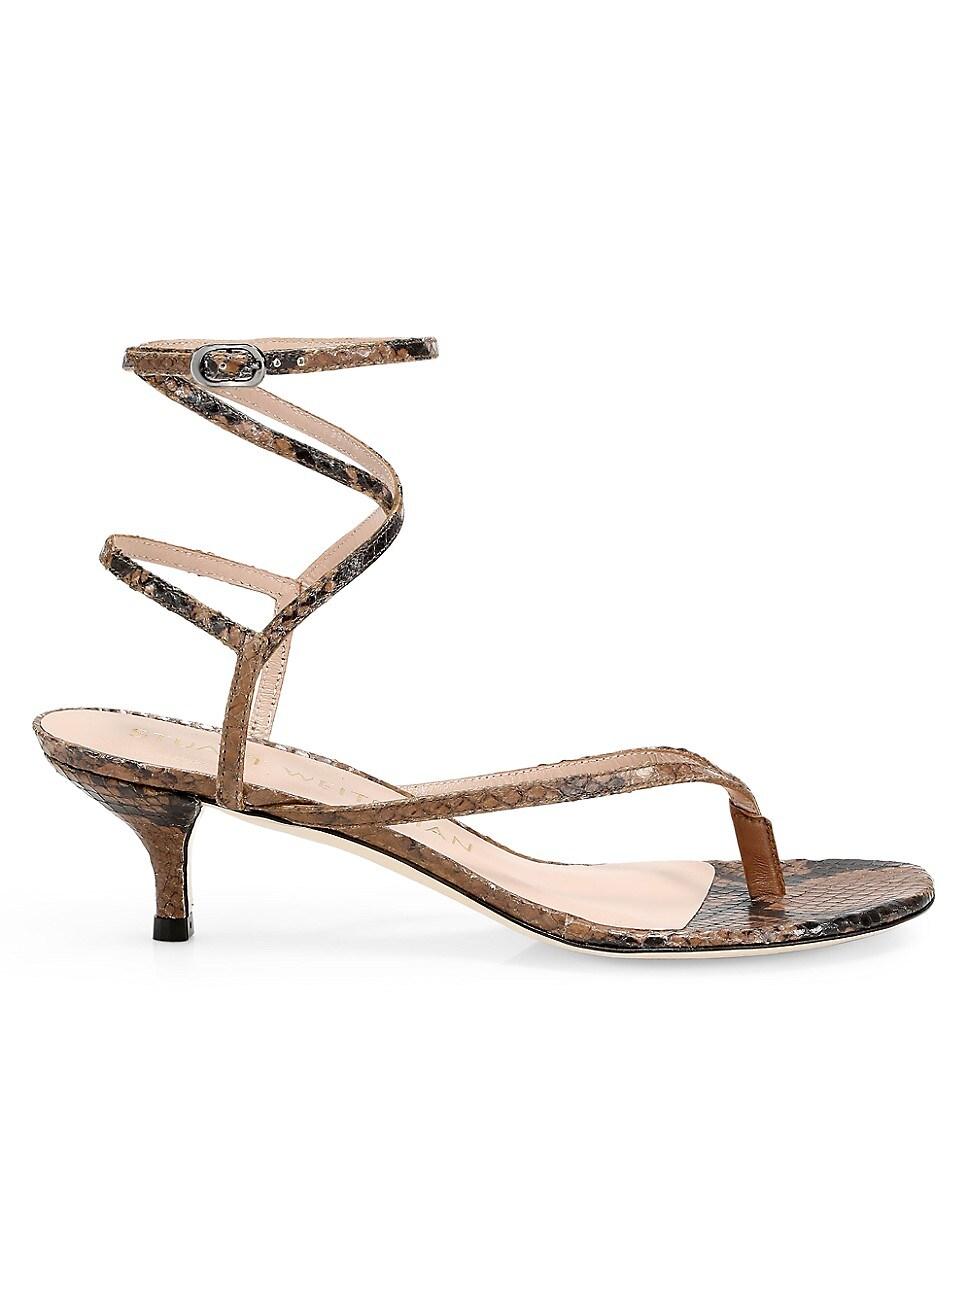 Stuart Weitzman Mid heels WOMEN'S JIMENA SNAKESKIN-EMBOSSED LEATHER THONG SANDALS